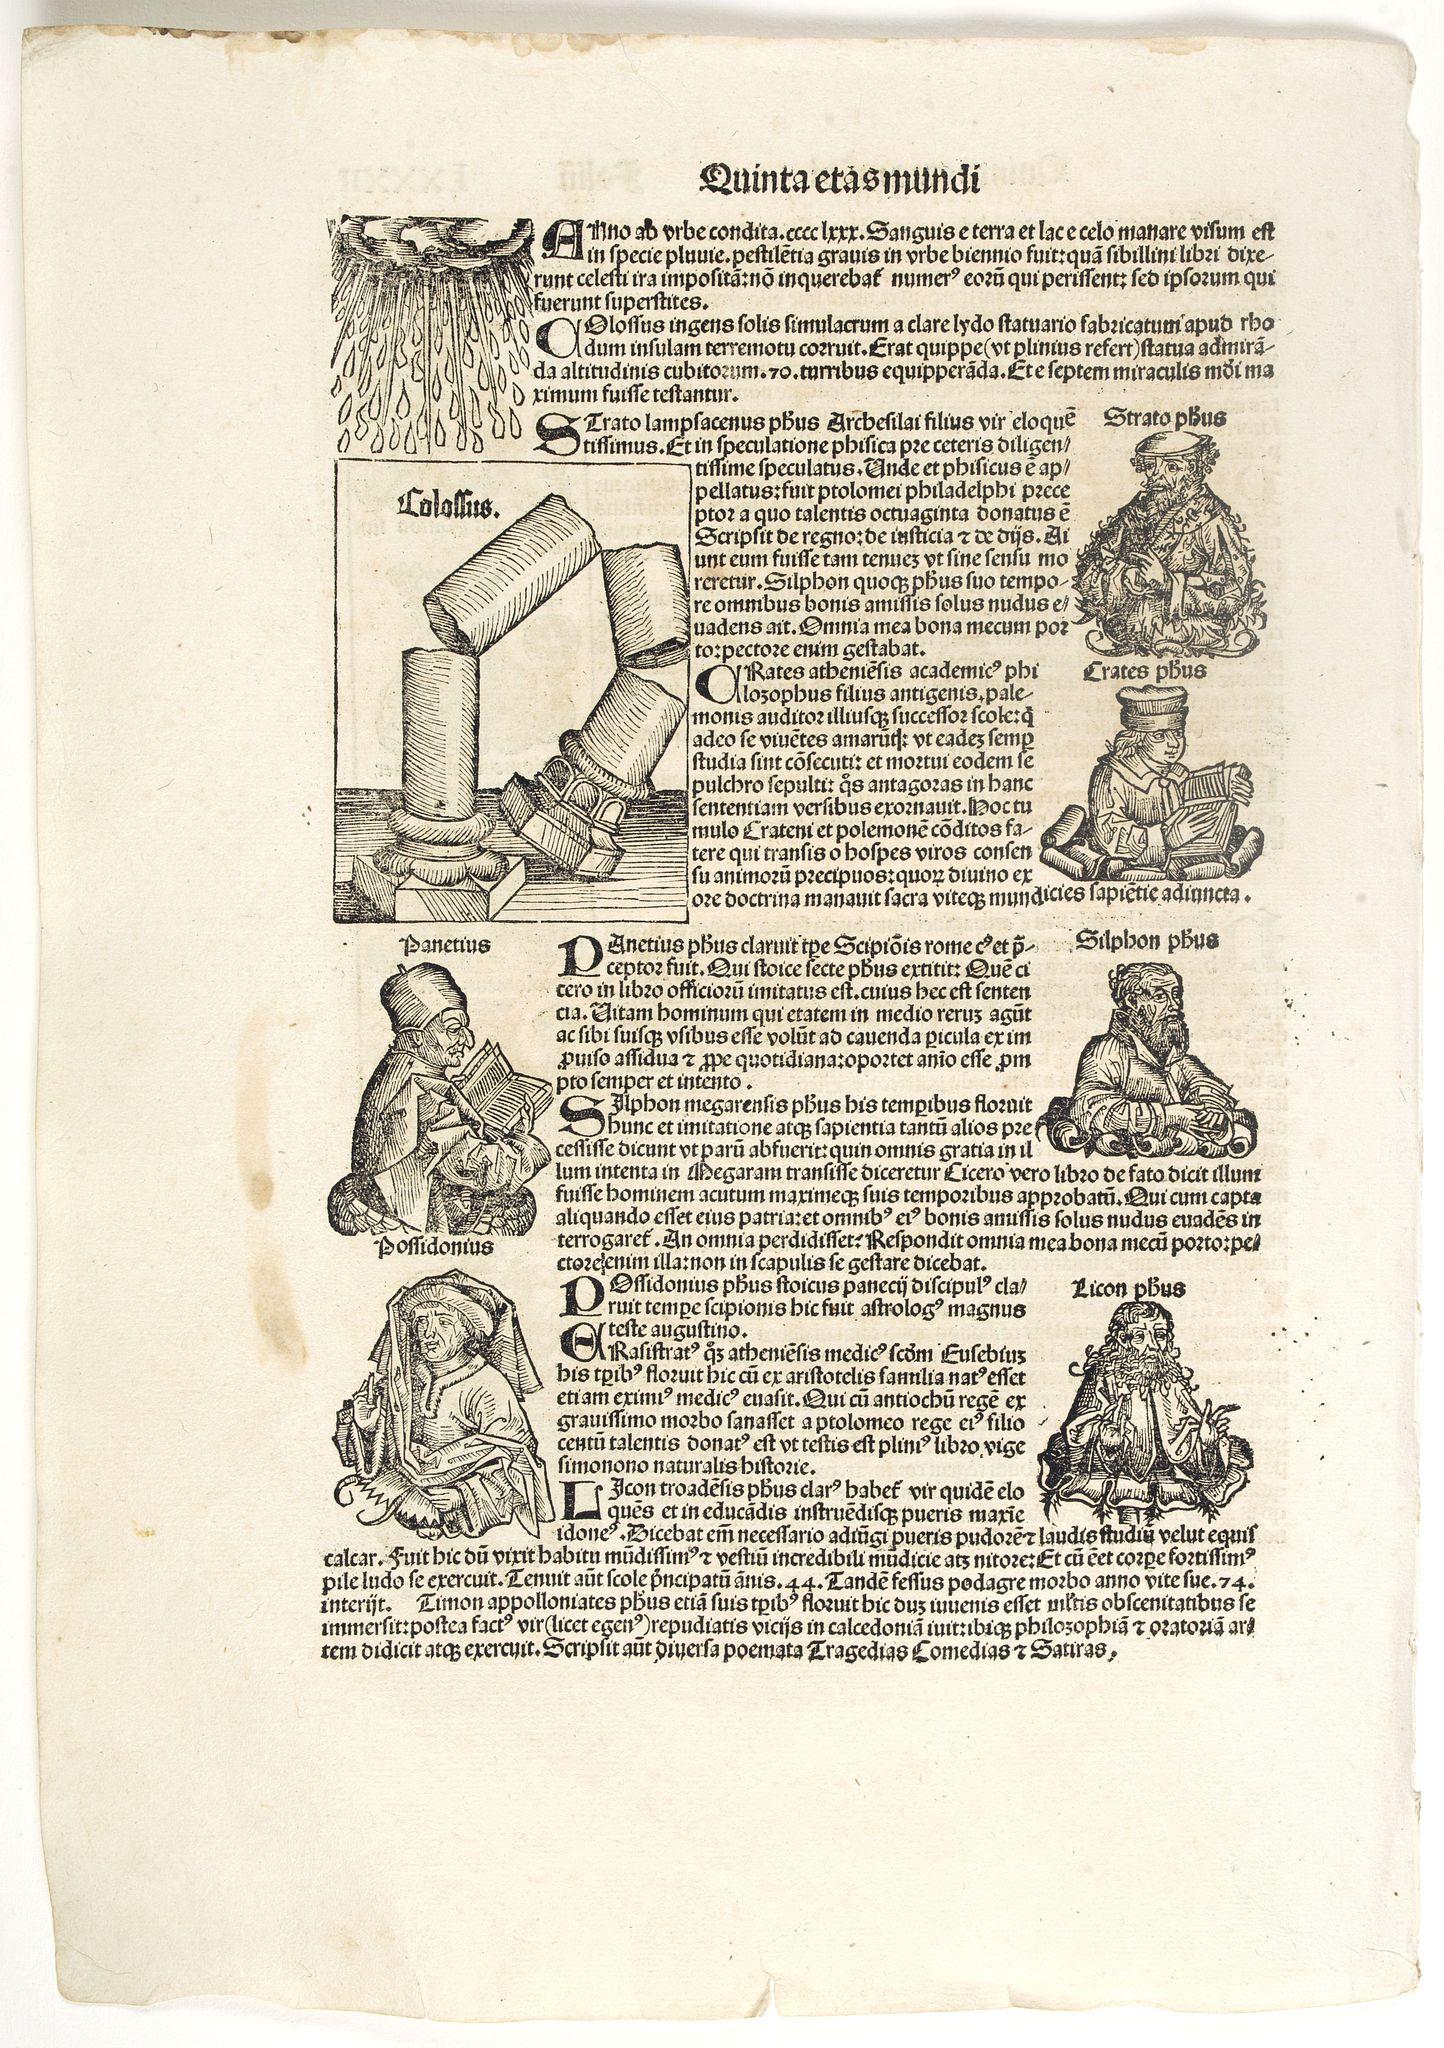 SCHEDEL, H. -  Quinta Etas Mundi. Folium.LXXXII